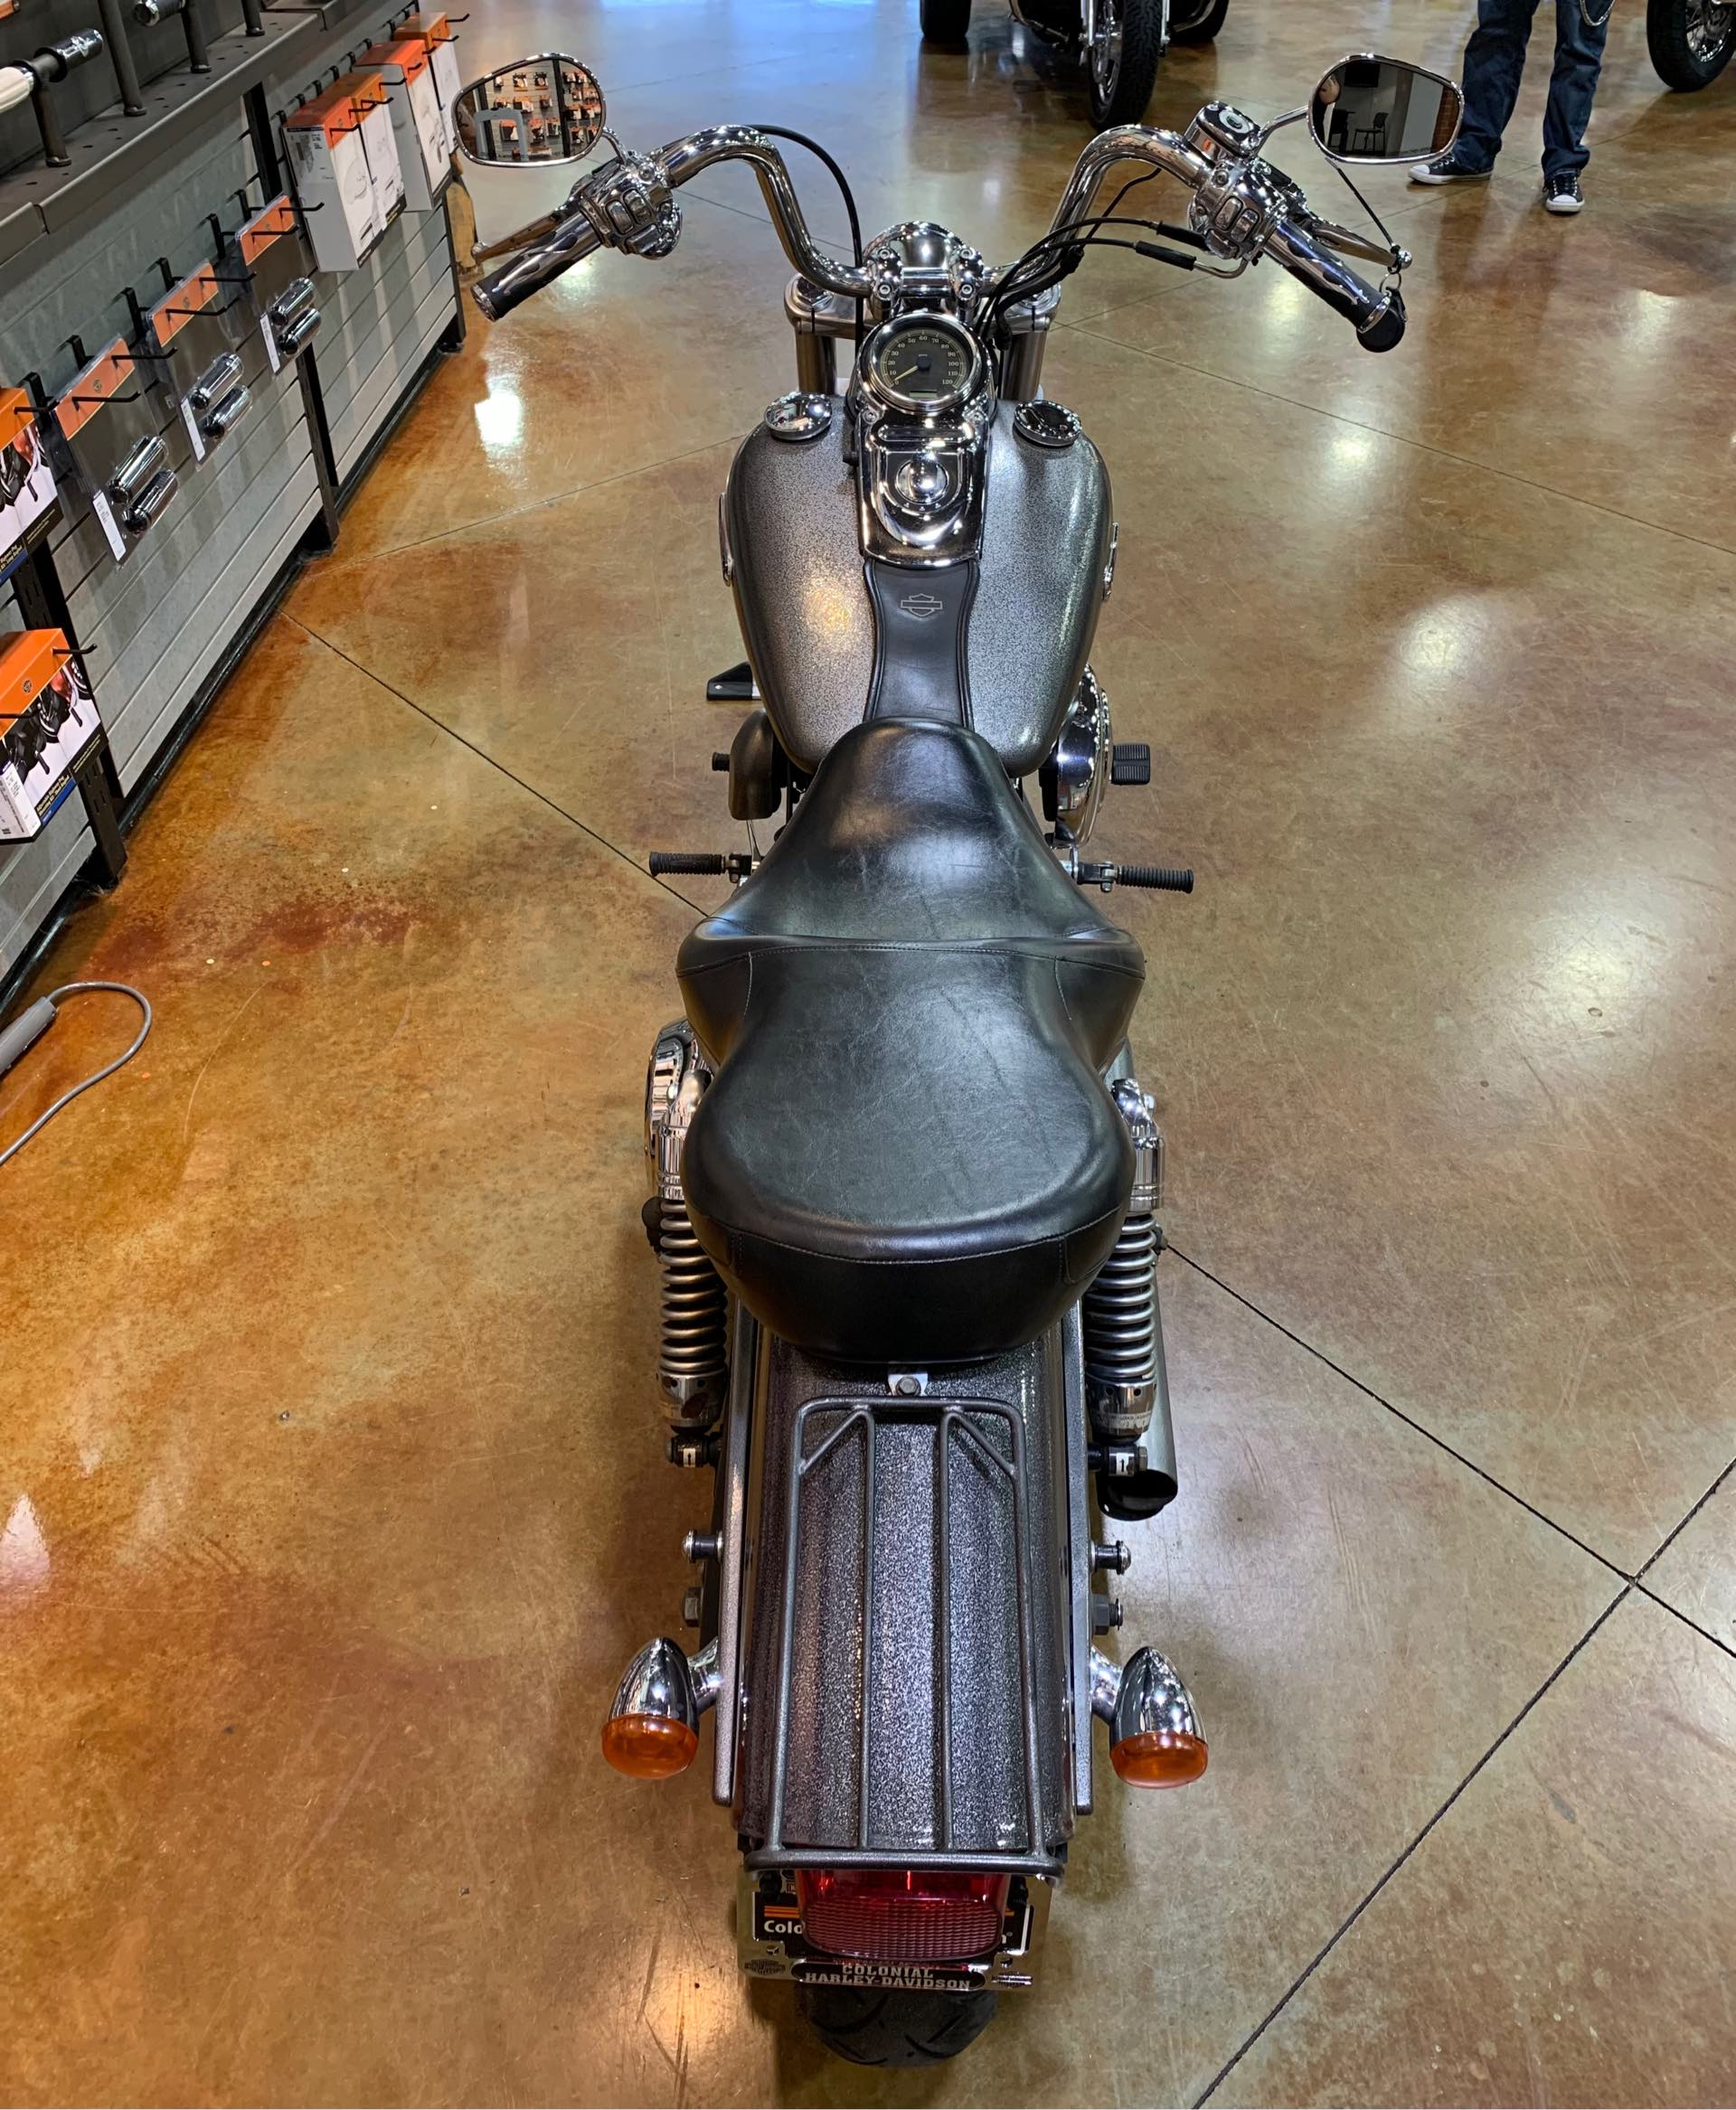 2006 Harley-Davidson Dyna Glide Wide Glide at Colonial Harley-Davidson